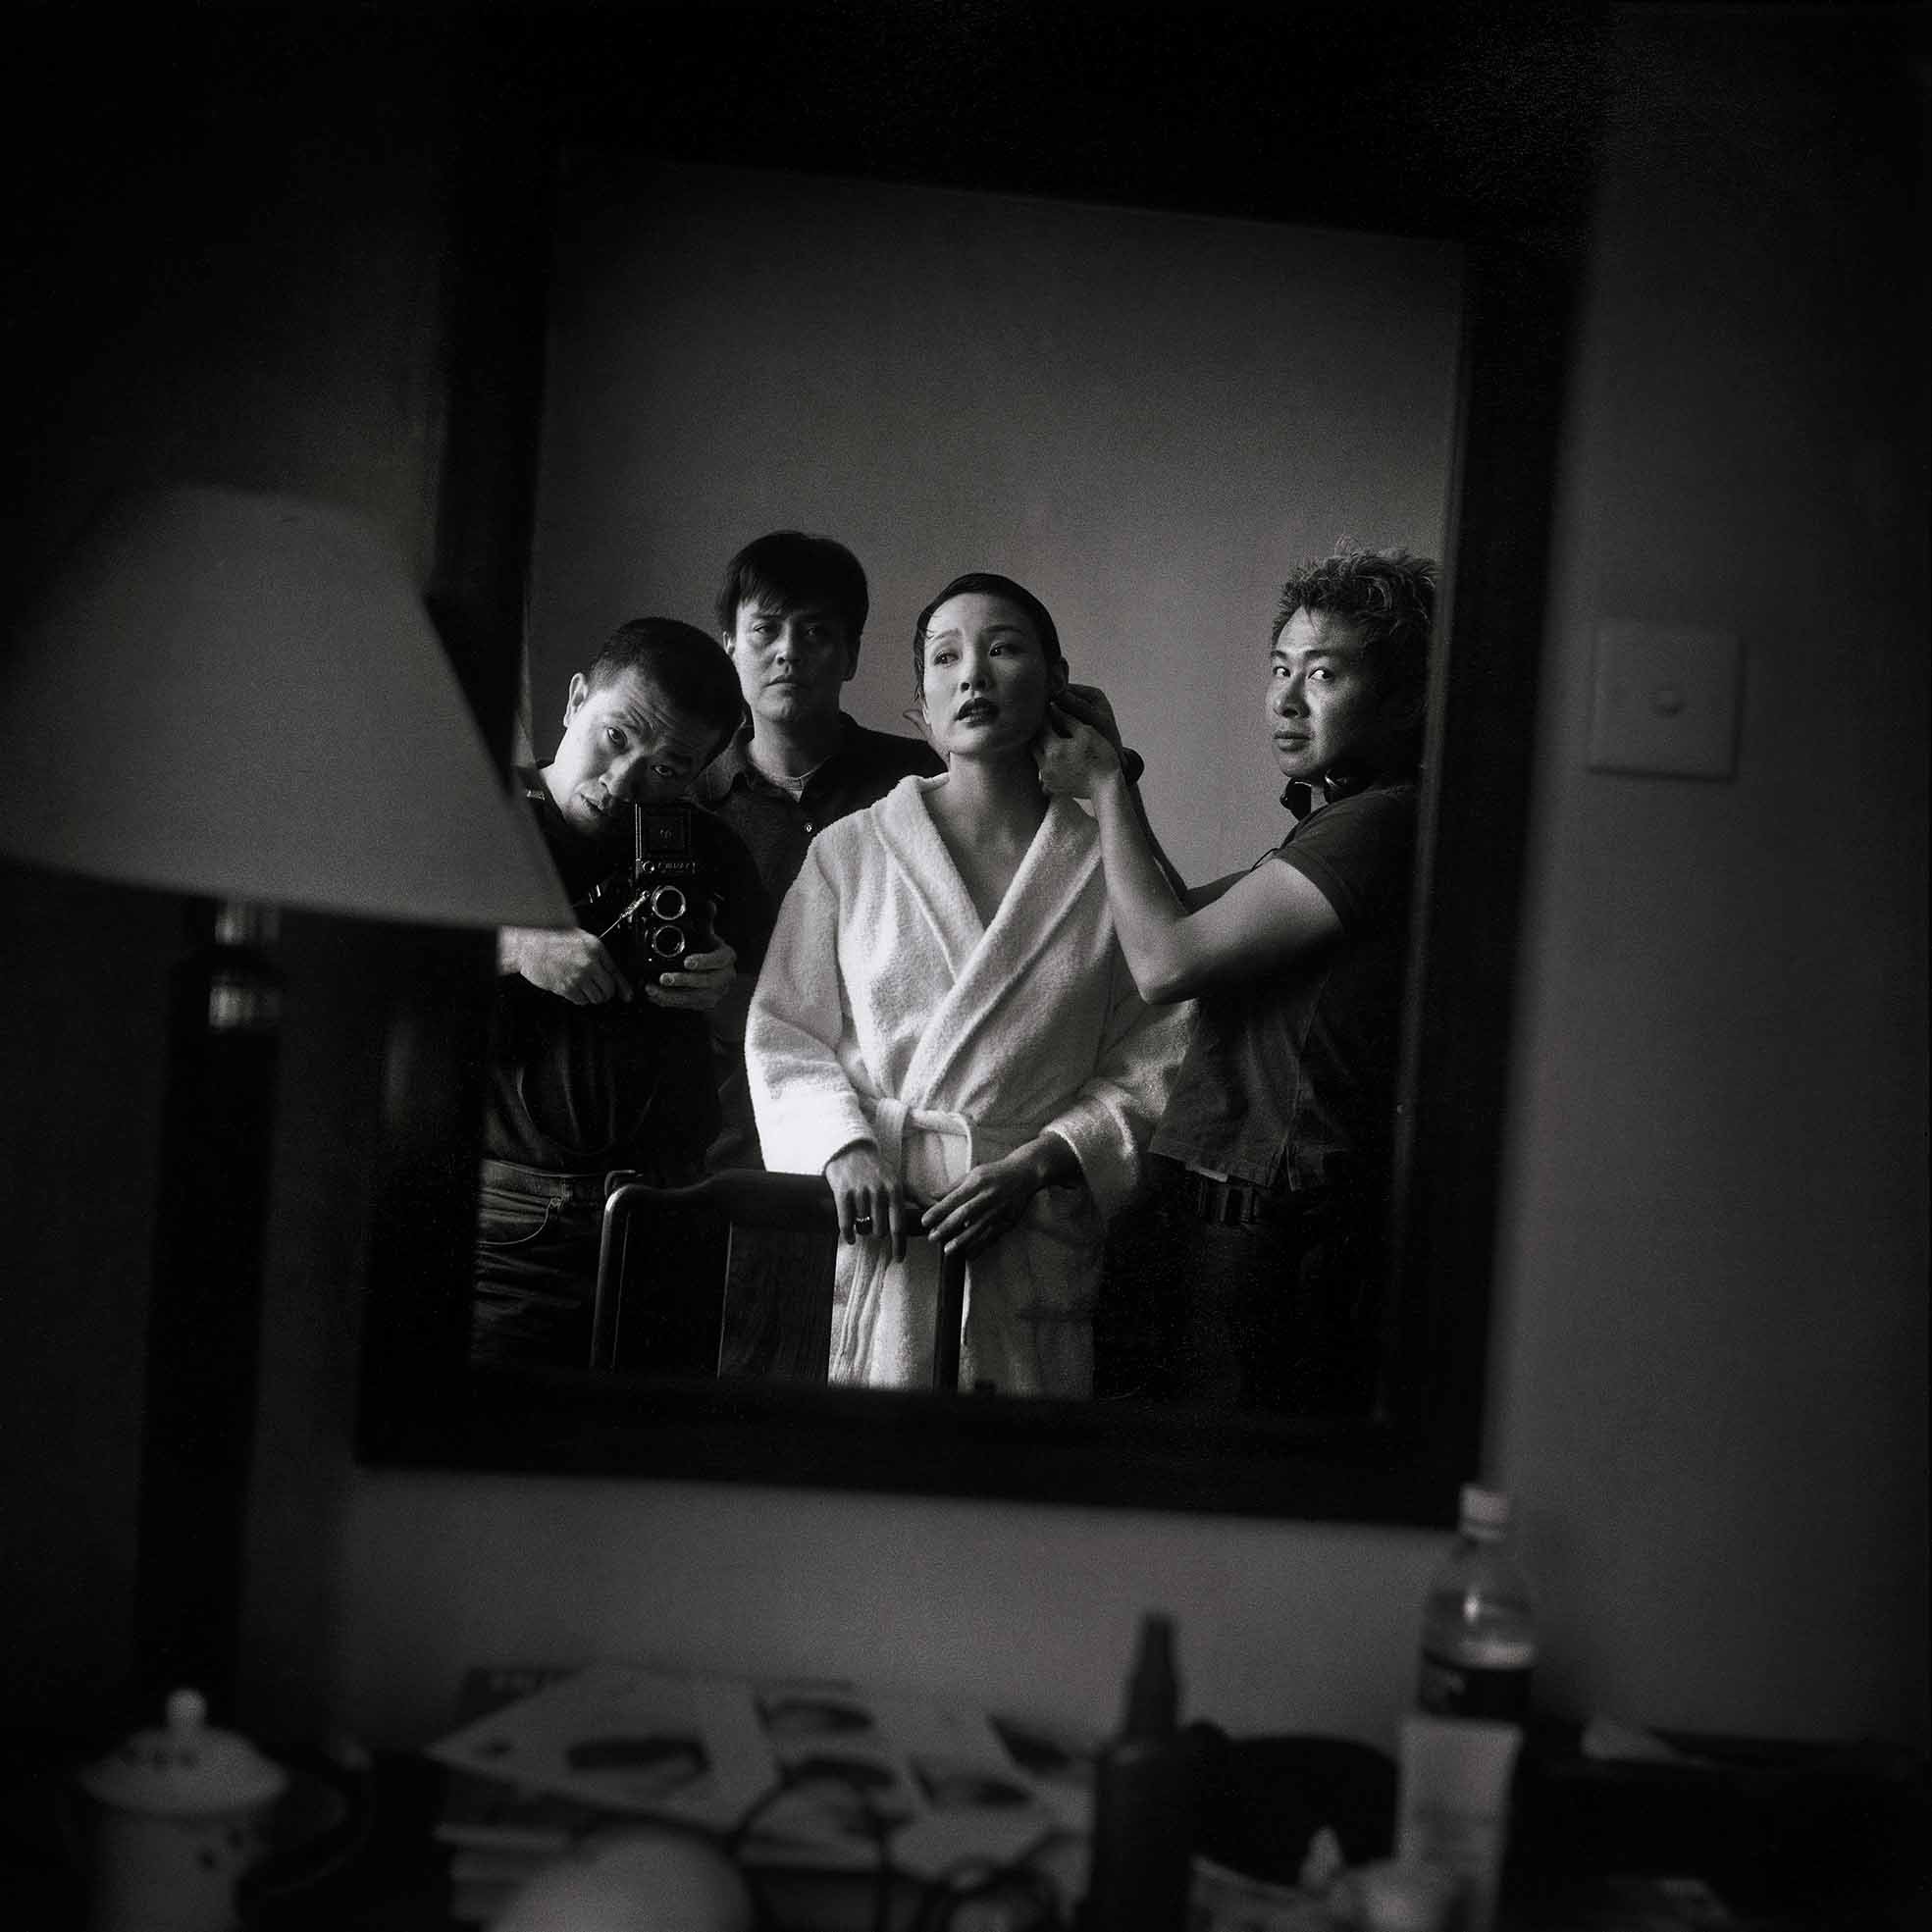 Zhang Hai'er,Joan Chen being made up by William Lee, while Sun Zhou and Zhang Hai'er watching, Longhua Hotel, Shanghai, 1999